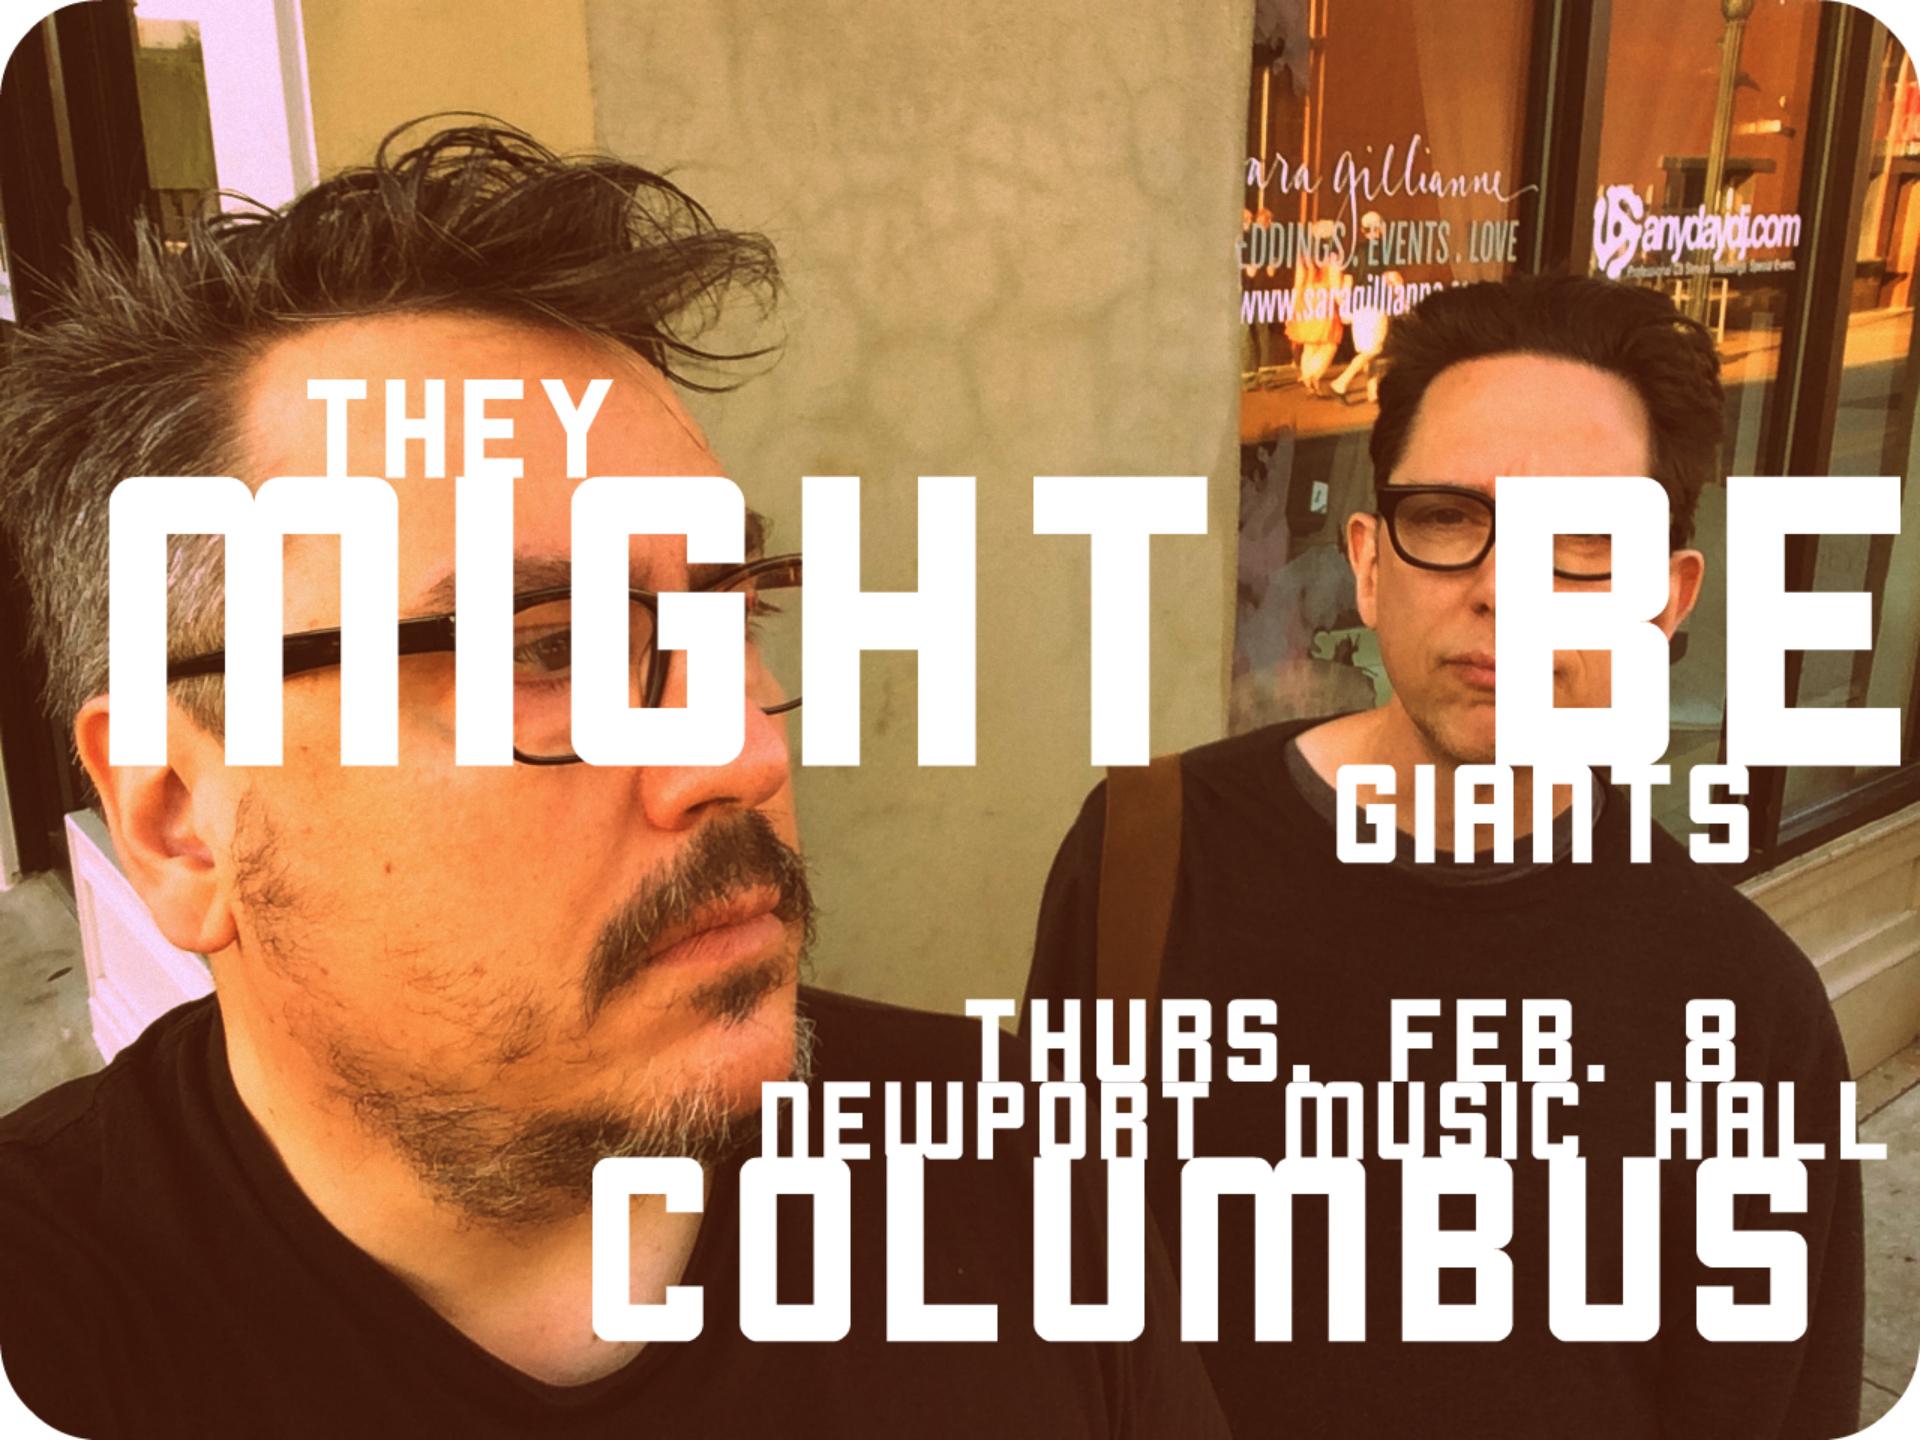 2.8 TMBG Columbus poster IV to edit.jpg